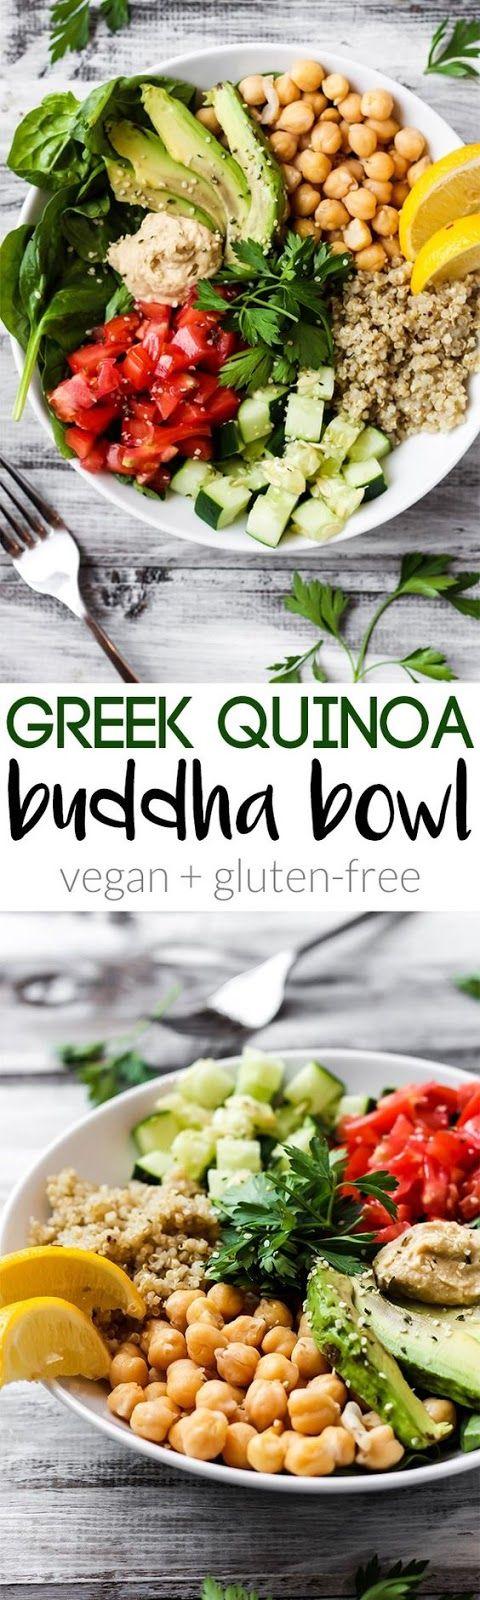 Griechische Quinoa Buddha Bowl & ein spezielles Ankündigung Rezept  #rezepte #r…